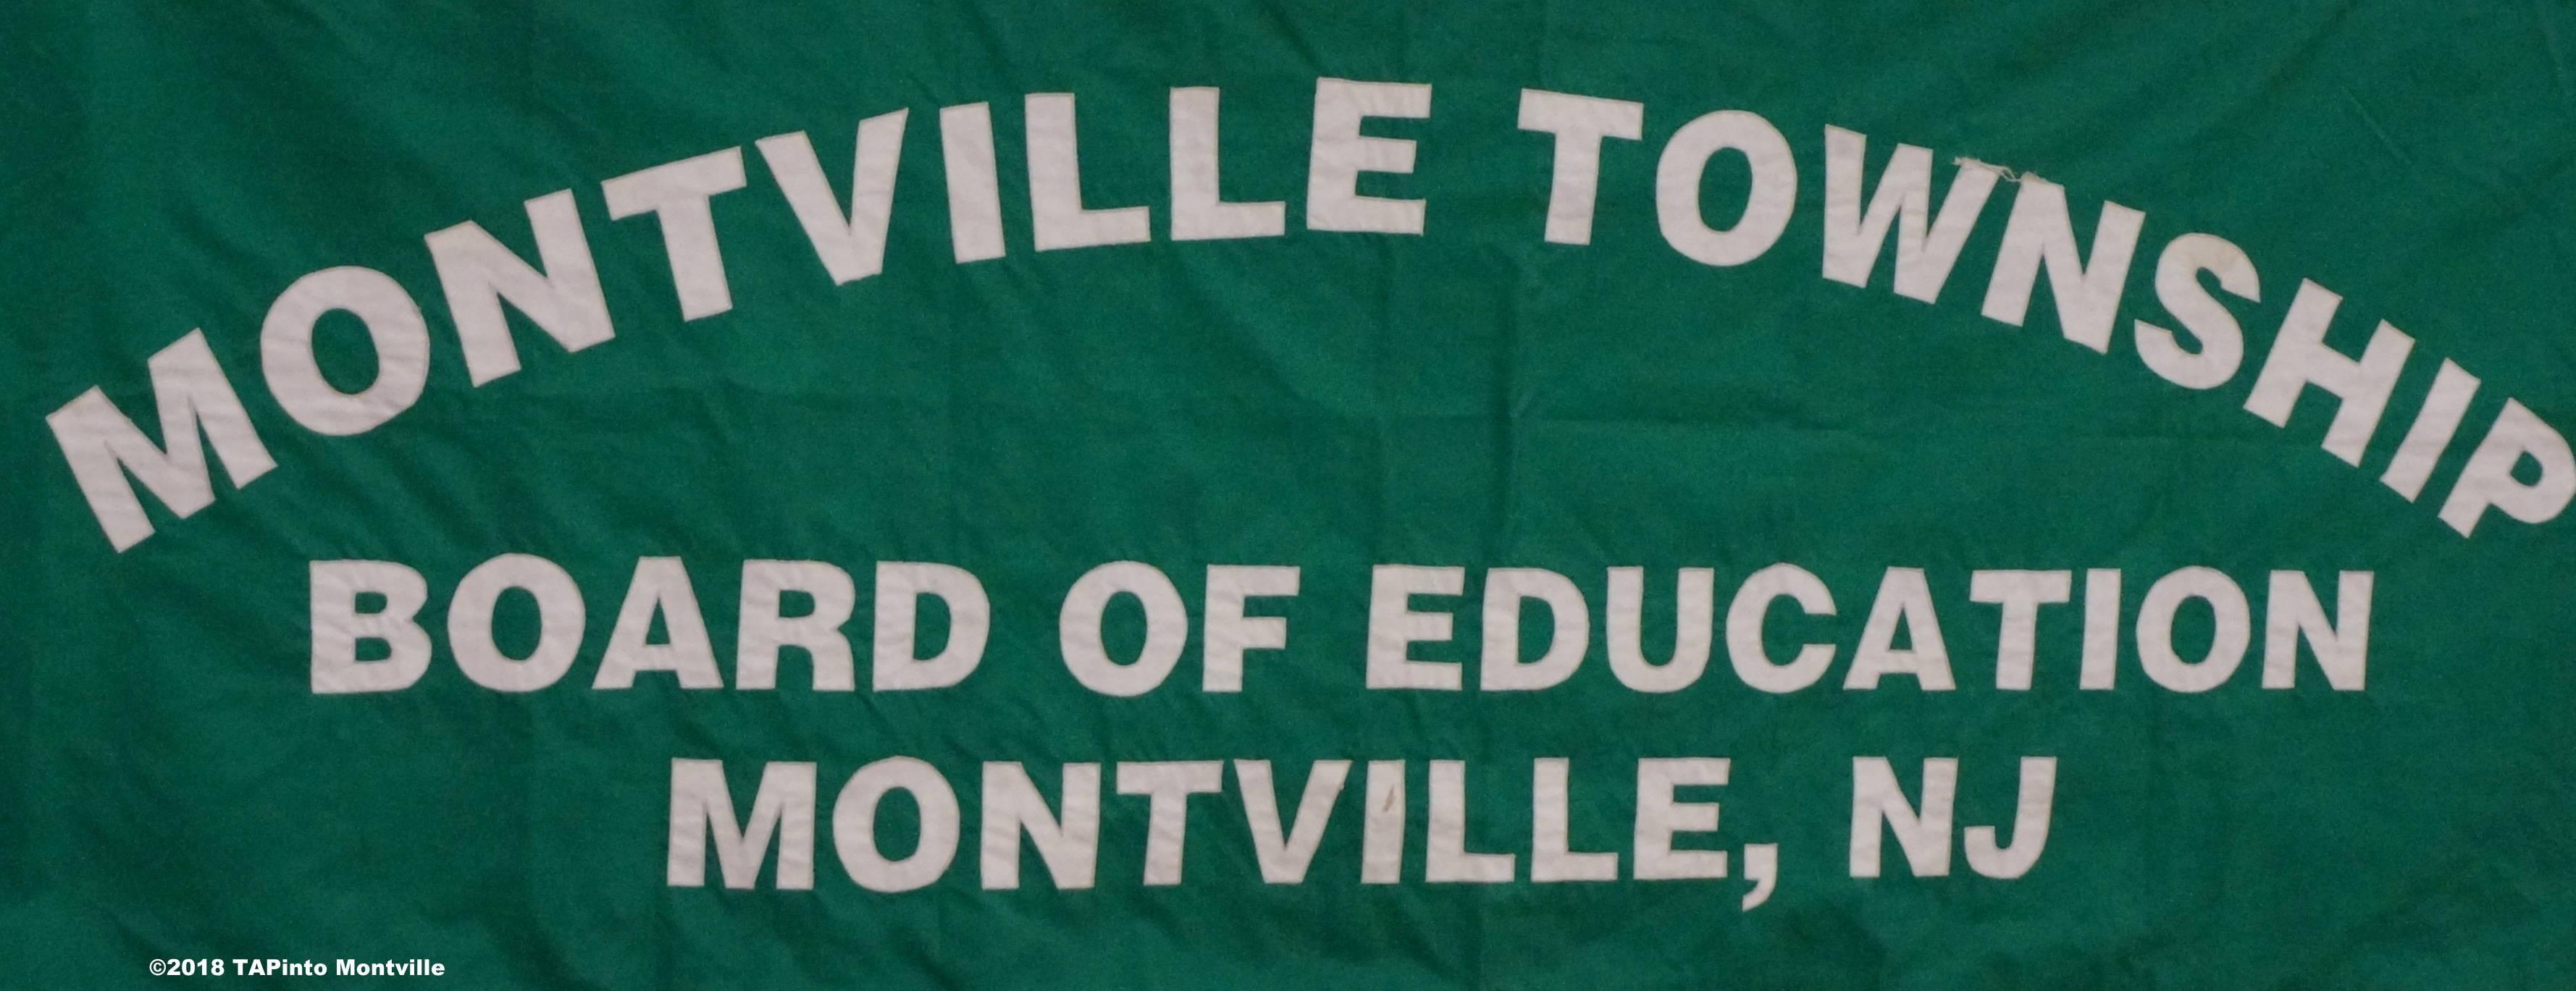 449cac5b6f9f7e81e836_Board_of_Education__2018_TAPinto_Montville____1..JPG